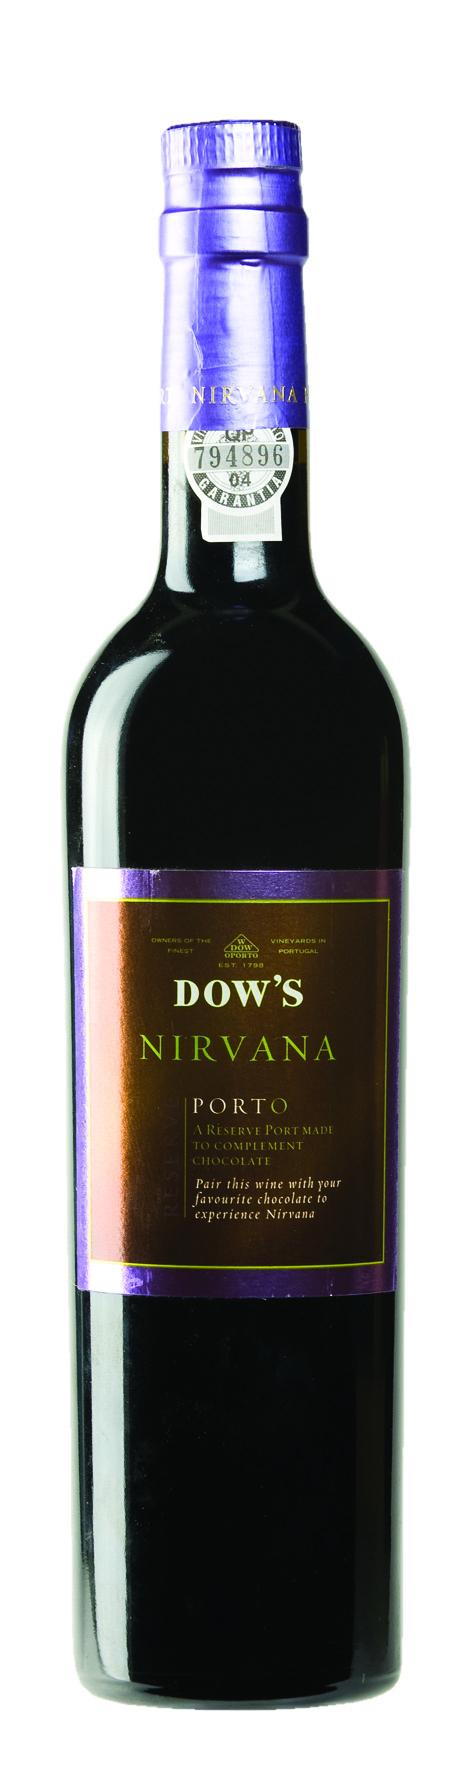 DOW's Nirvana Reserva Port